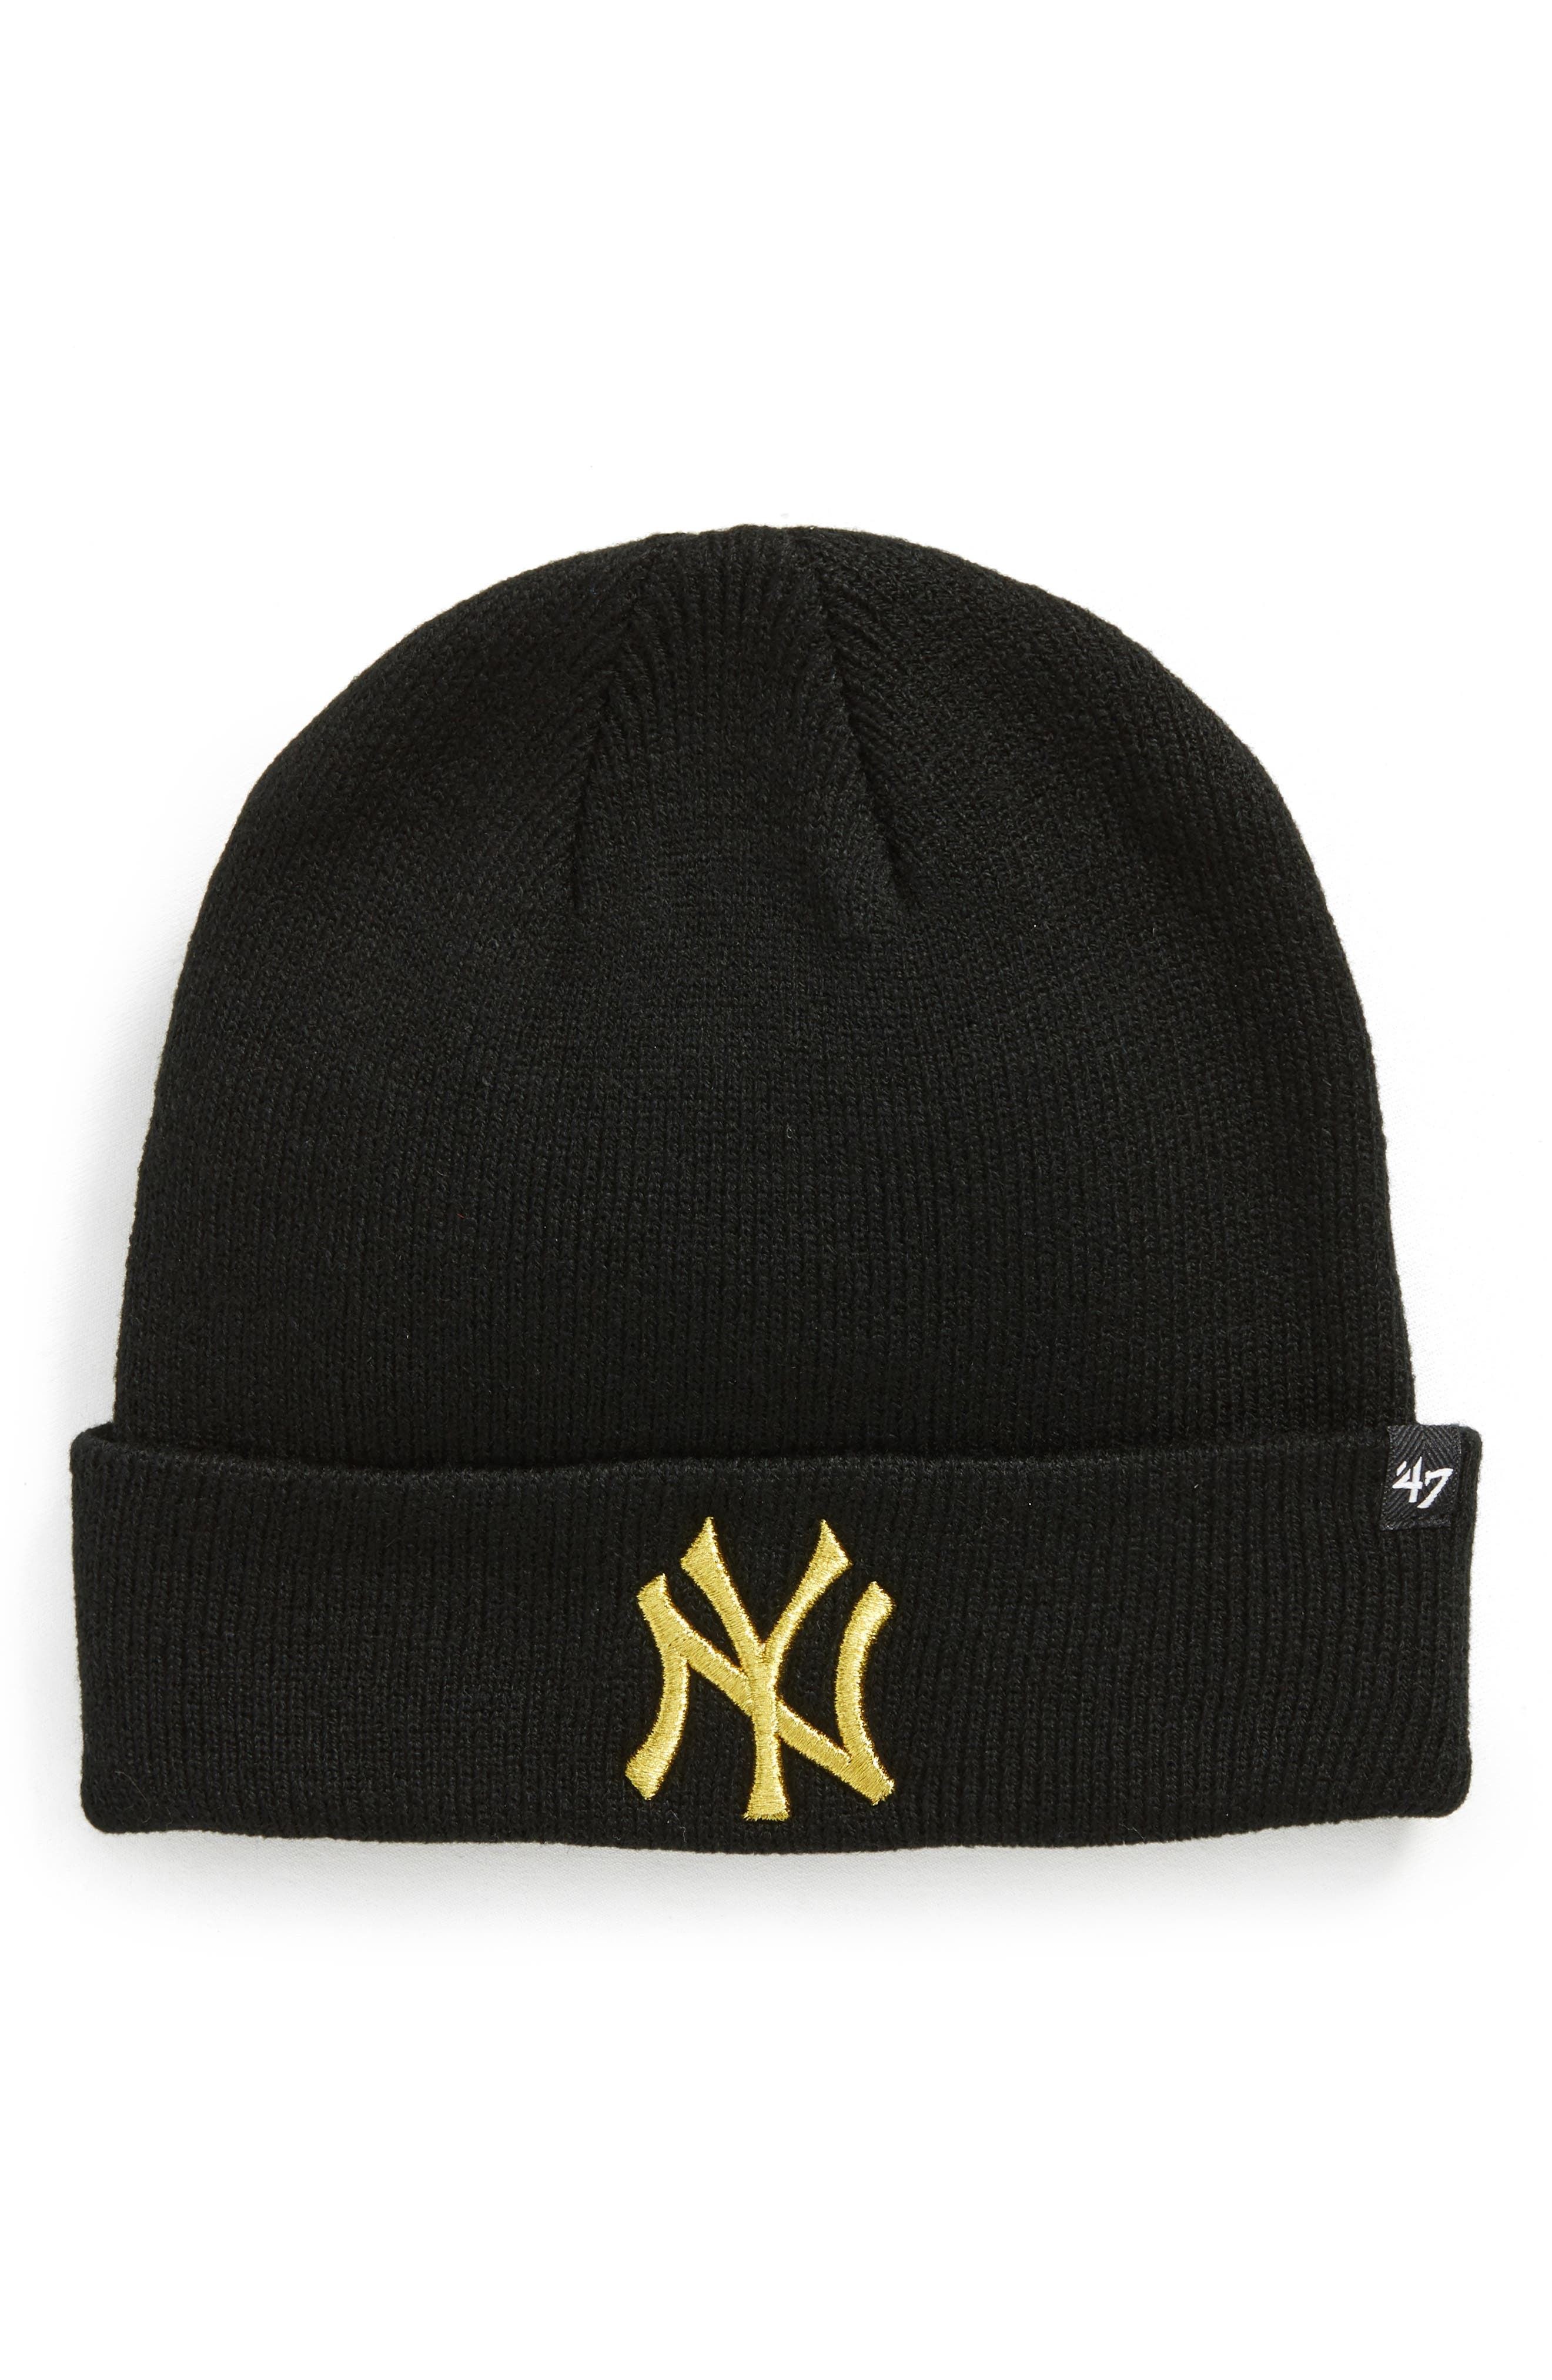 New York Yankees Metallic Beanie,                             Main thumbnail 1, color,                             001